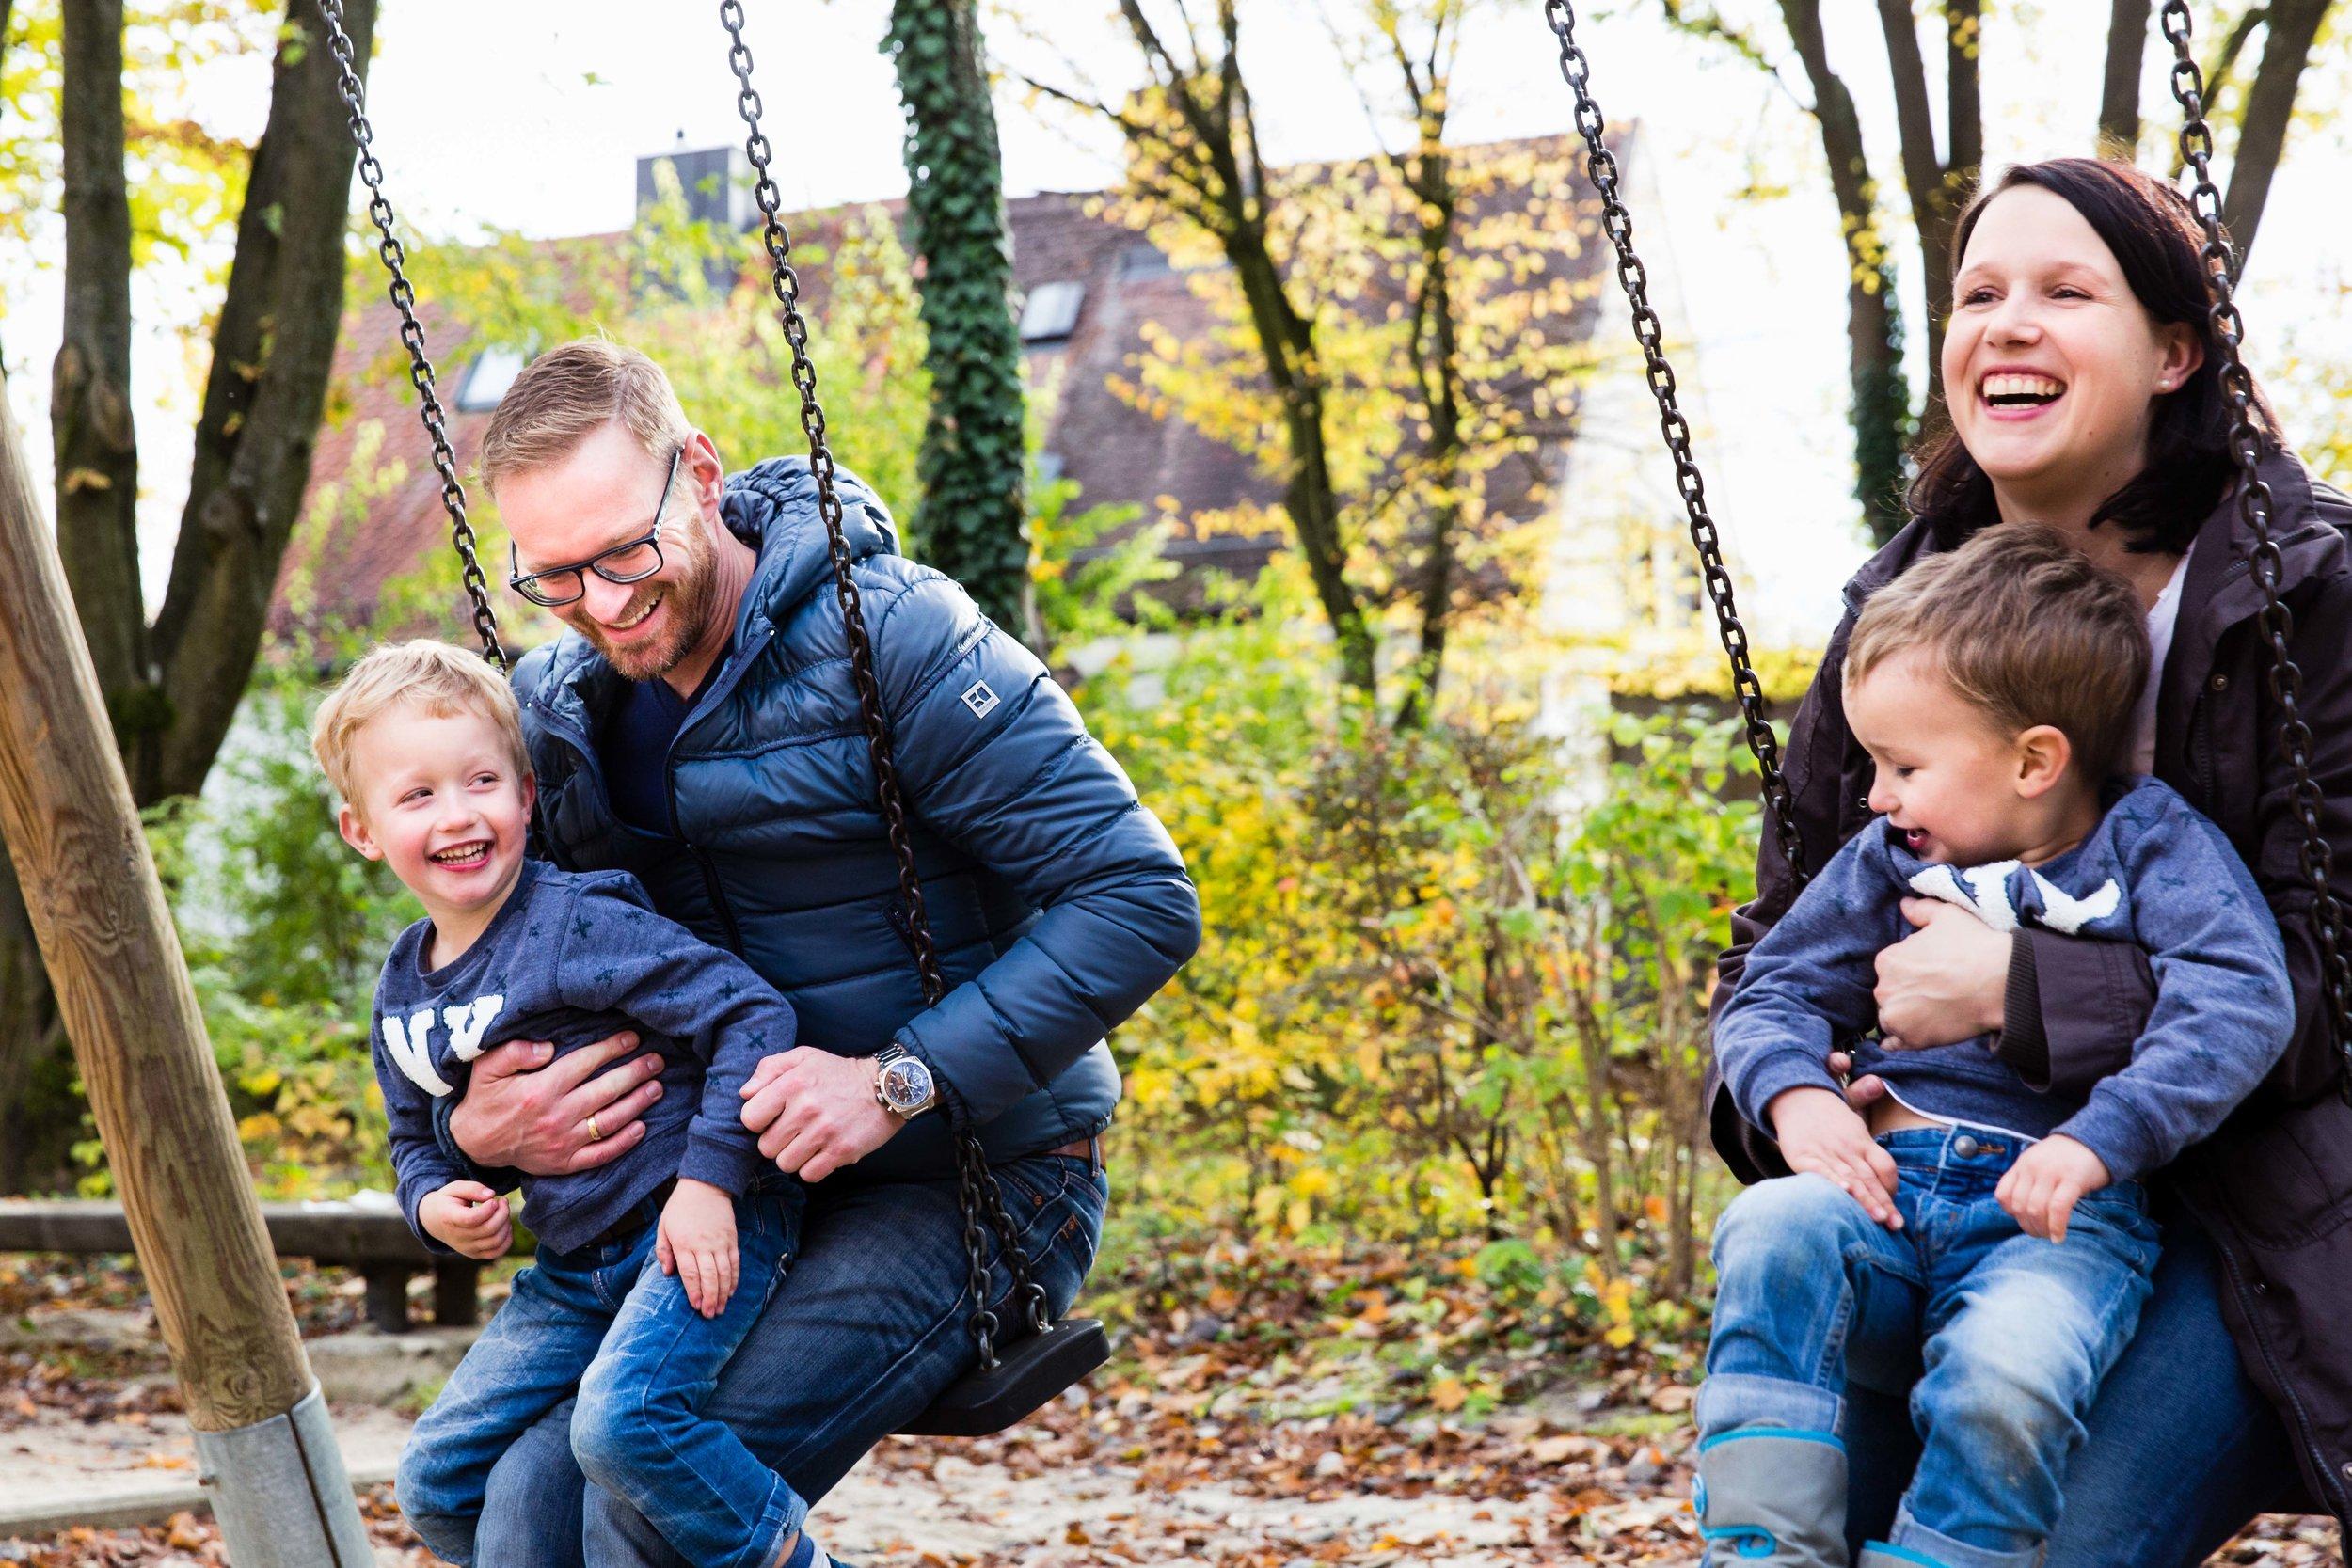 Kinderfotografie Familienfotografie München